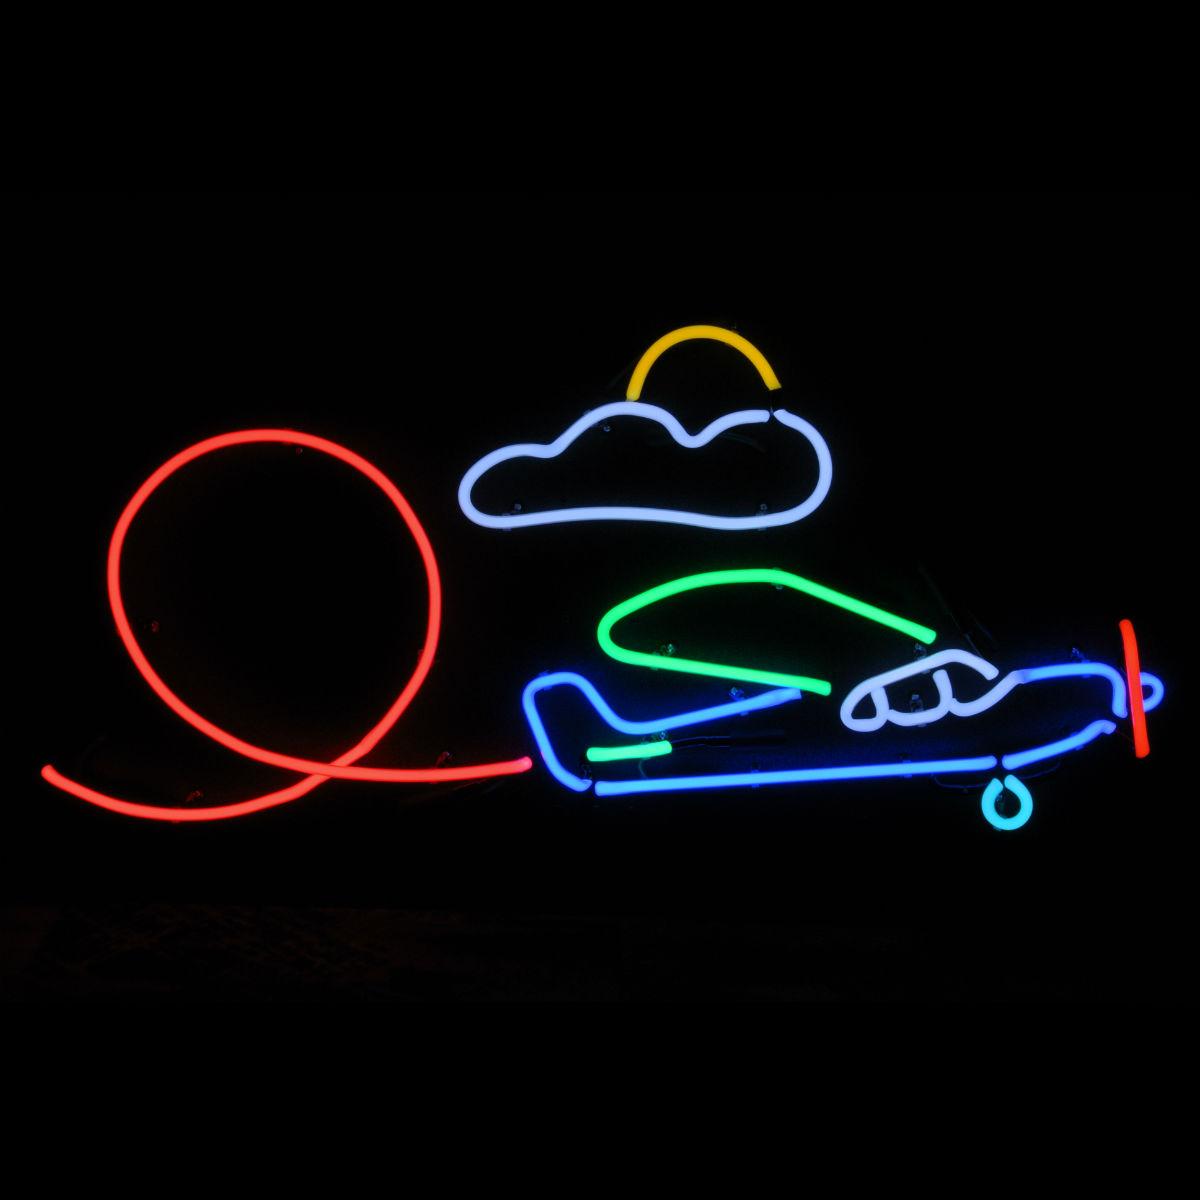 Neon Airplane Sculptures by John Barton - BartonNeonMagic.com